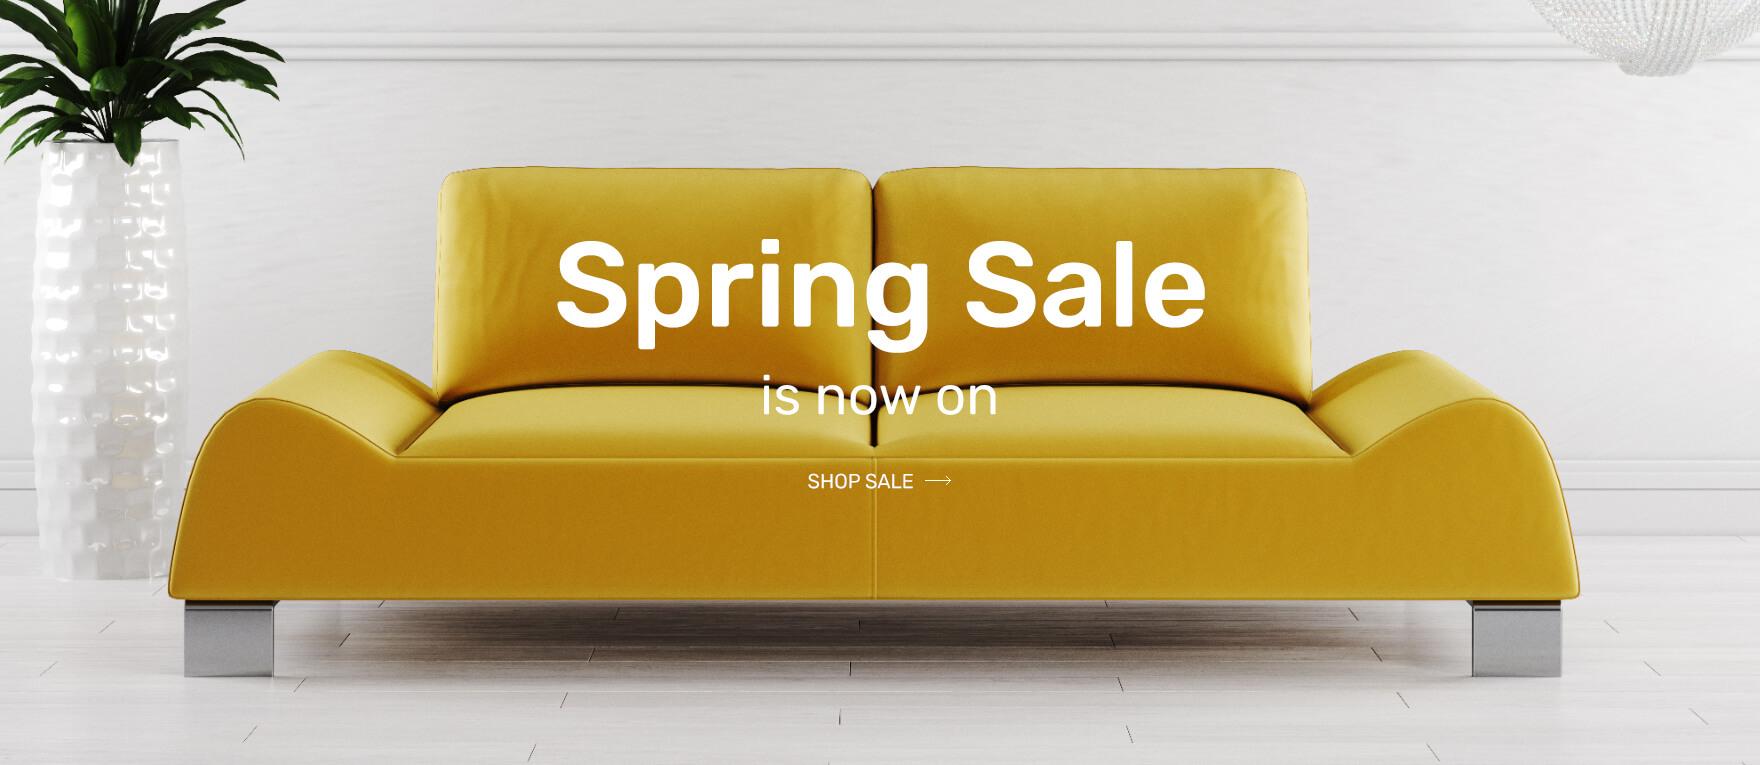 Spring Sale - Shop Now